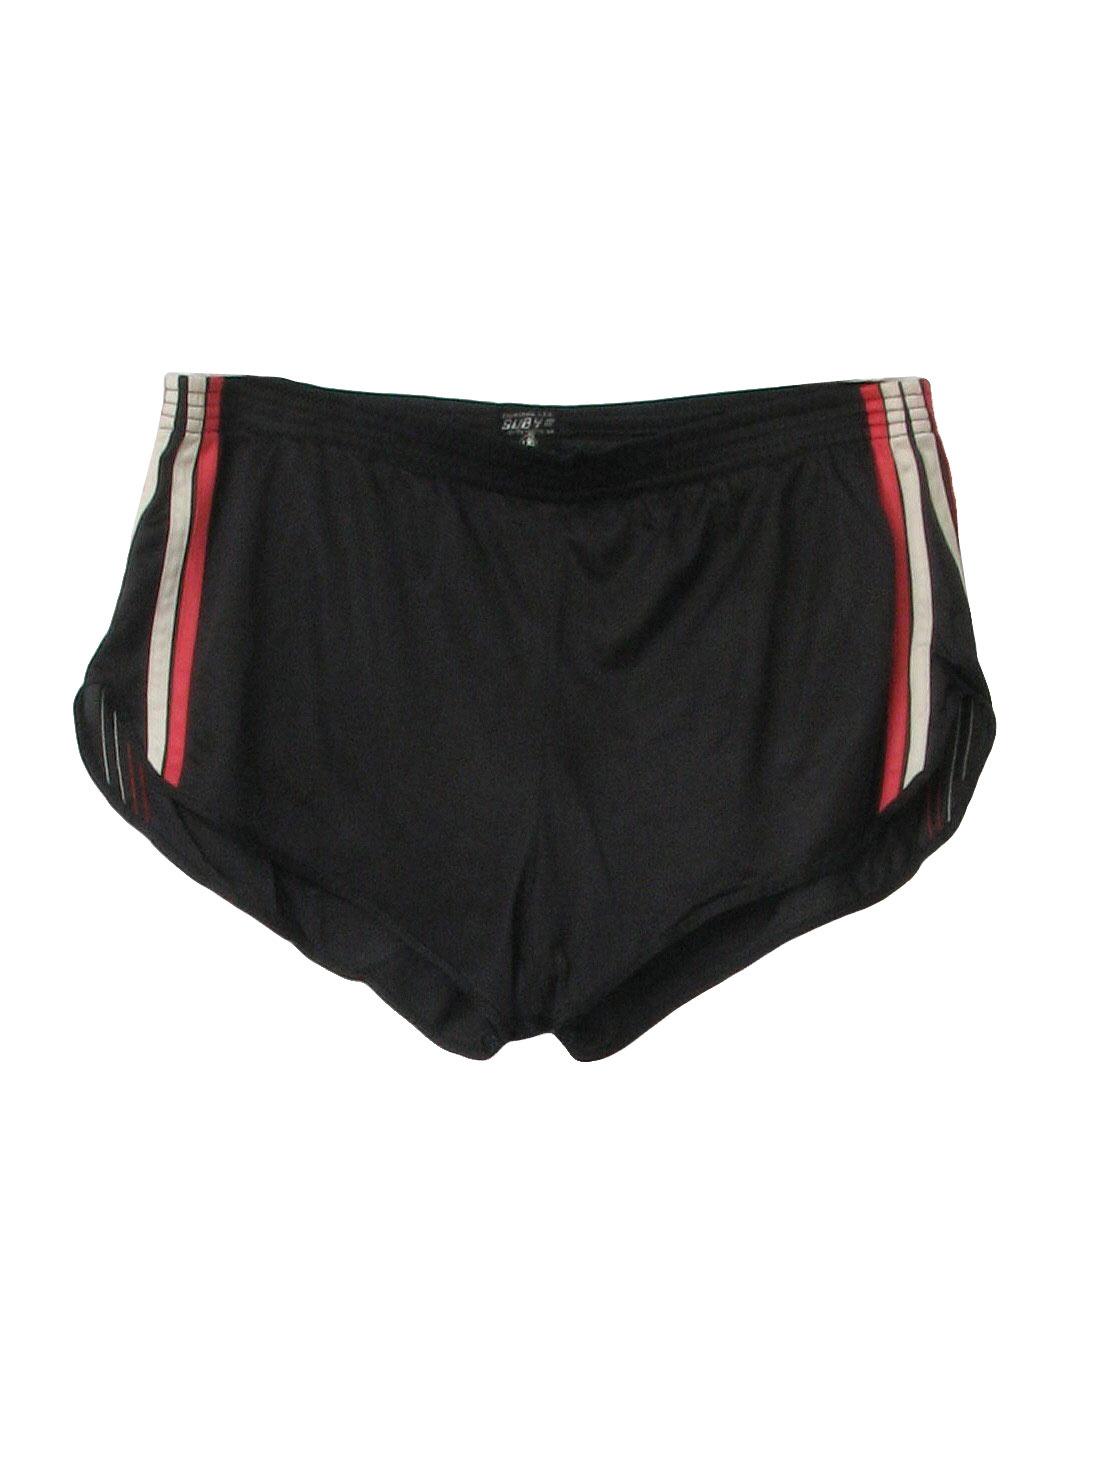 Eighties Sub 4 Shorts 80s Sub 4 Mens Well Worn Black